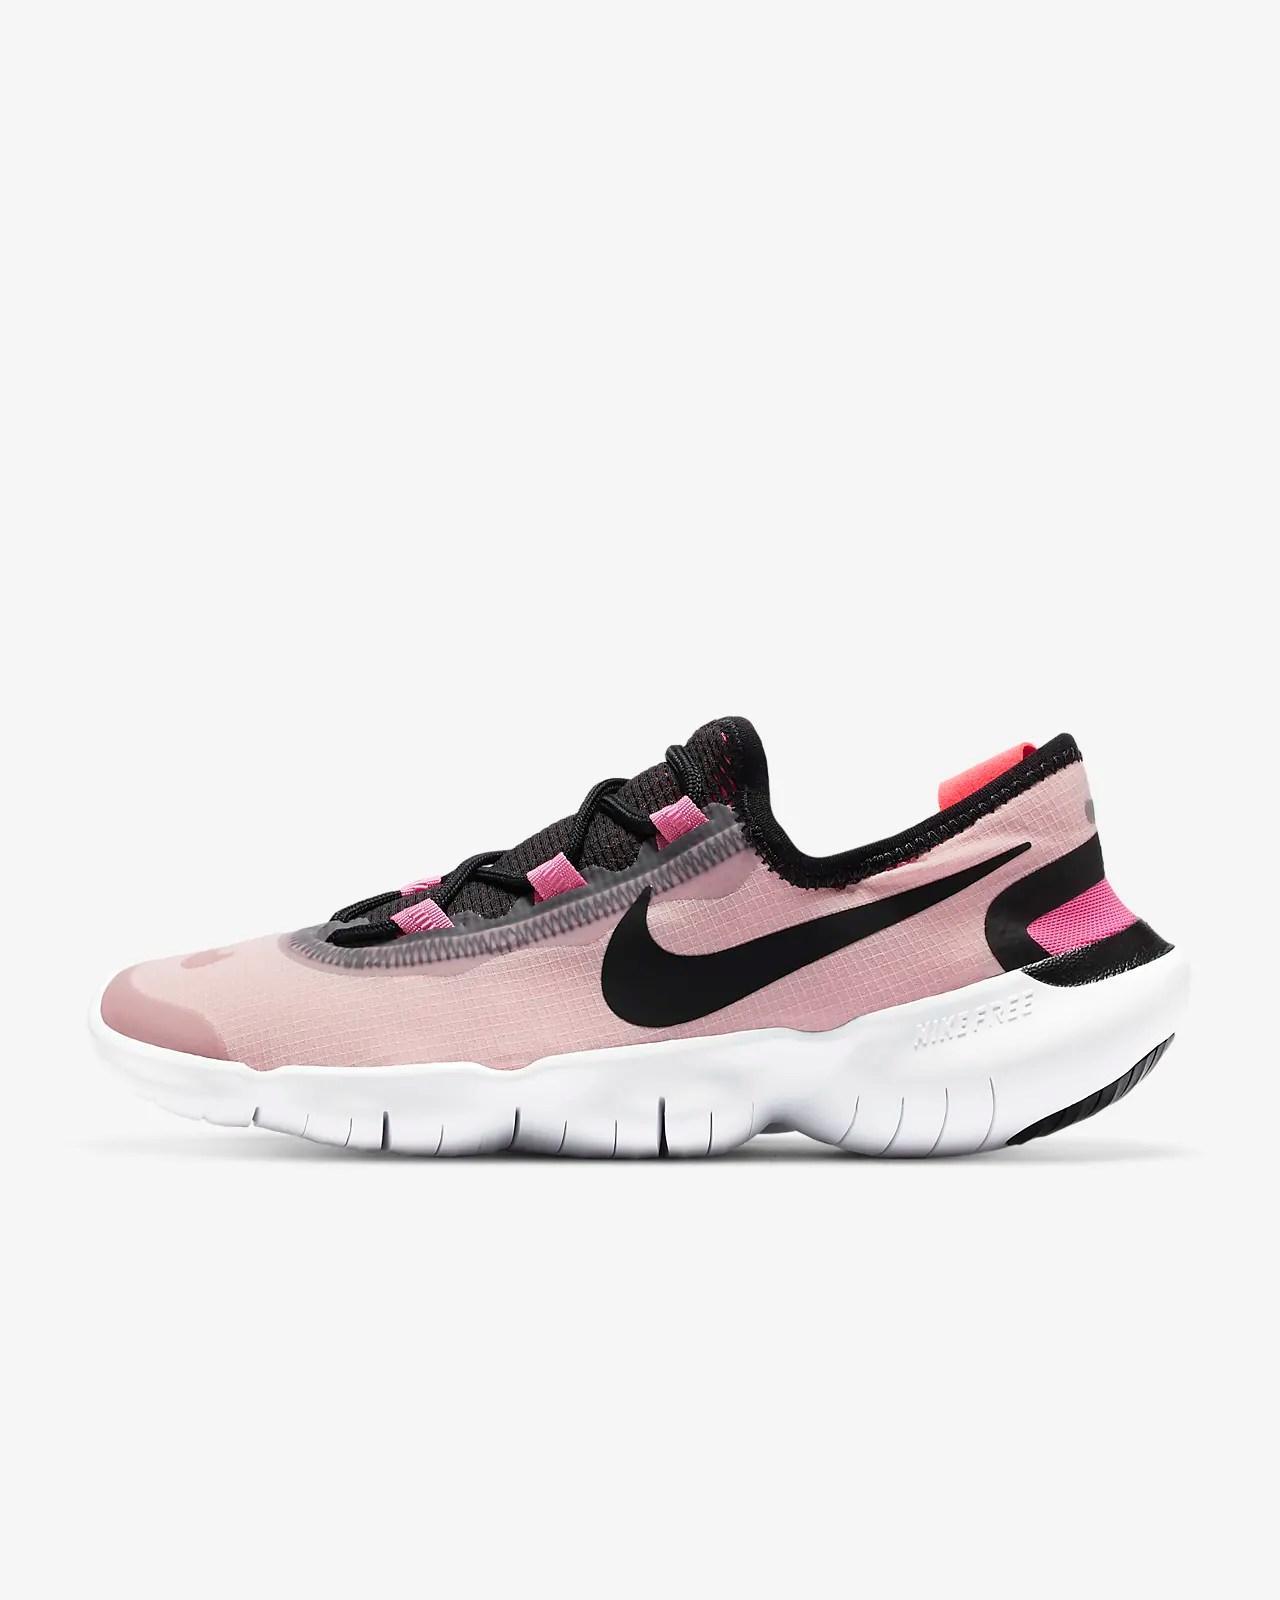 Nike Free RN 5.0 2020 女款跑鞋. Nike TW